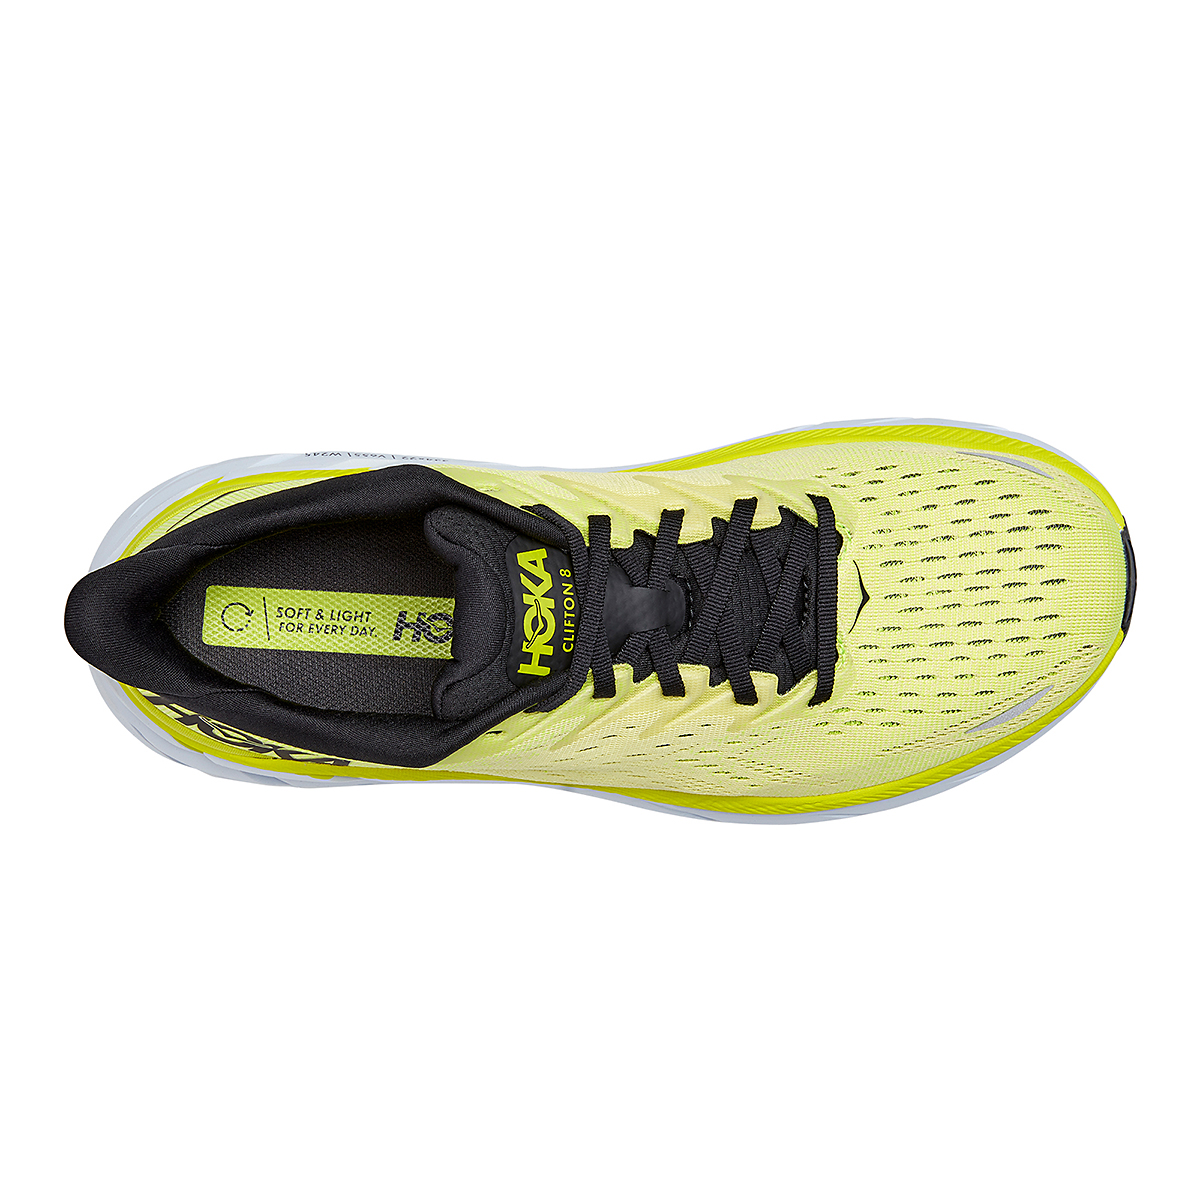 Men's Hoka One One Clifton 8 Running Shoe - Color: Evening Primrose/Charlock - Size: 7 - Width: Regular, Evening Primrose/Charlock, large, image 5